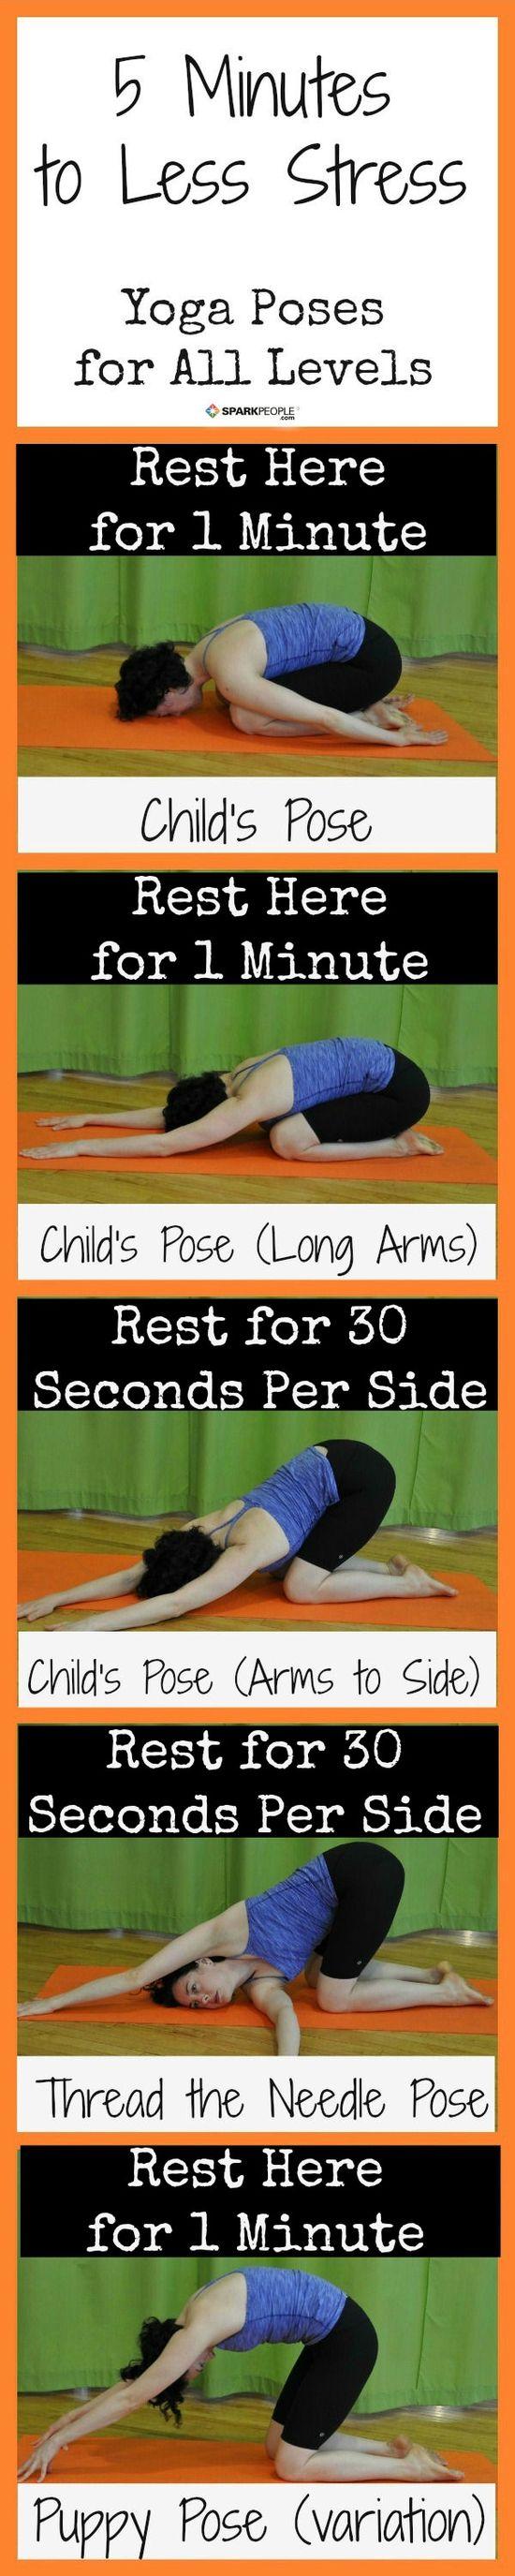 5-Minute #Yoga Routine to Beat Stress